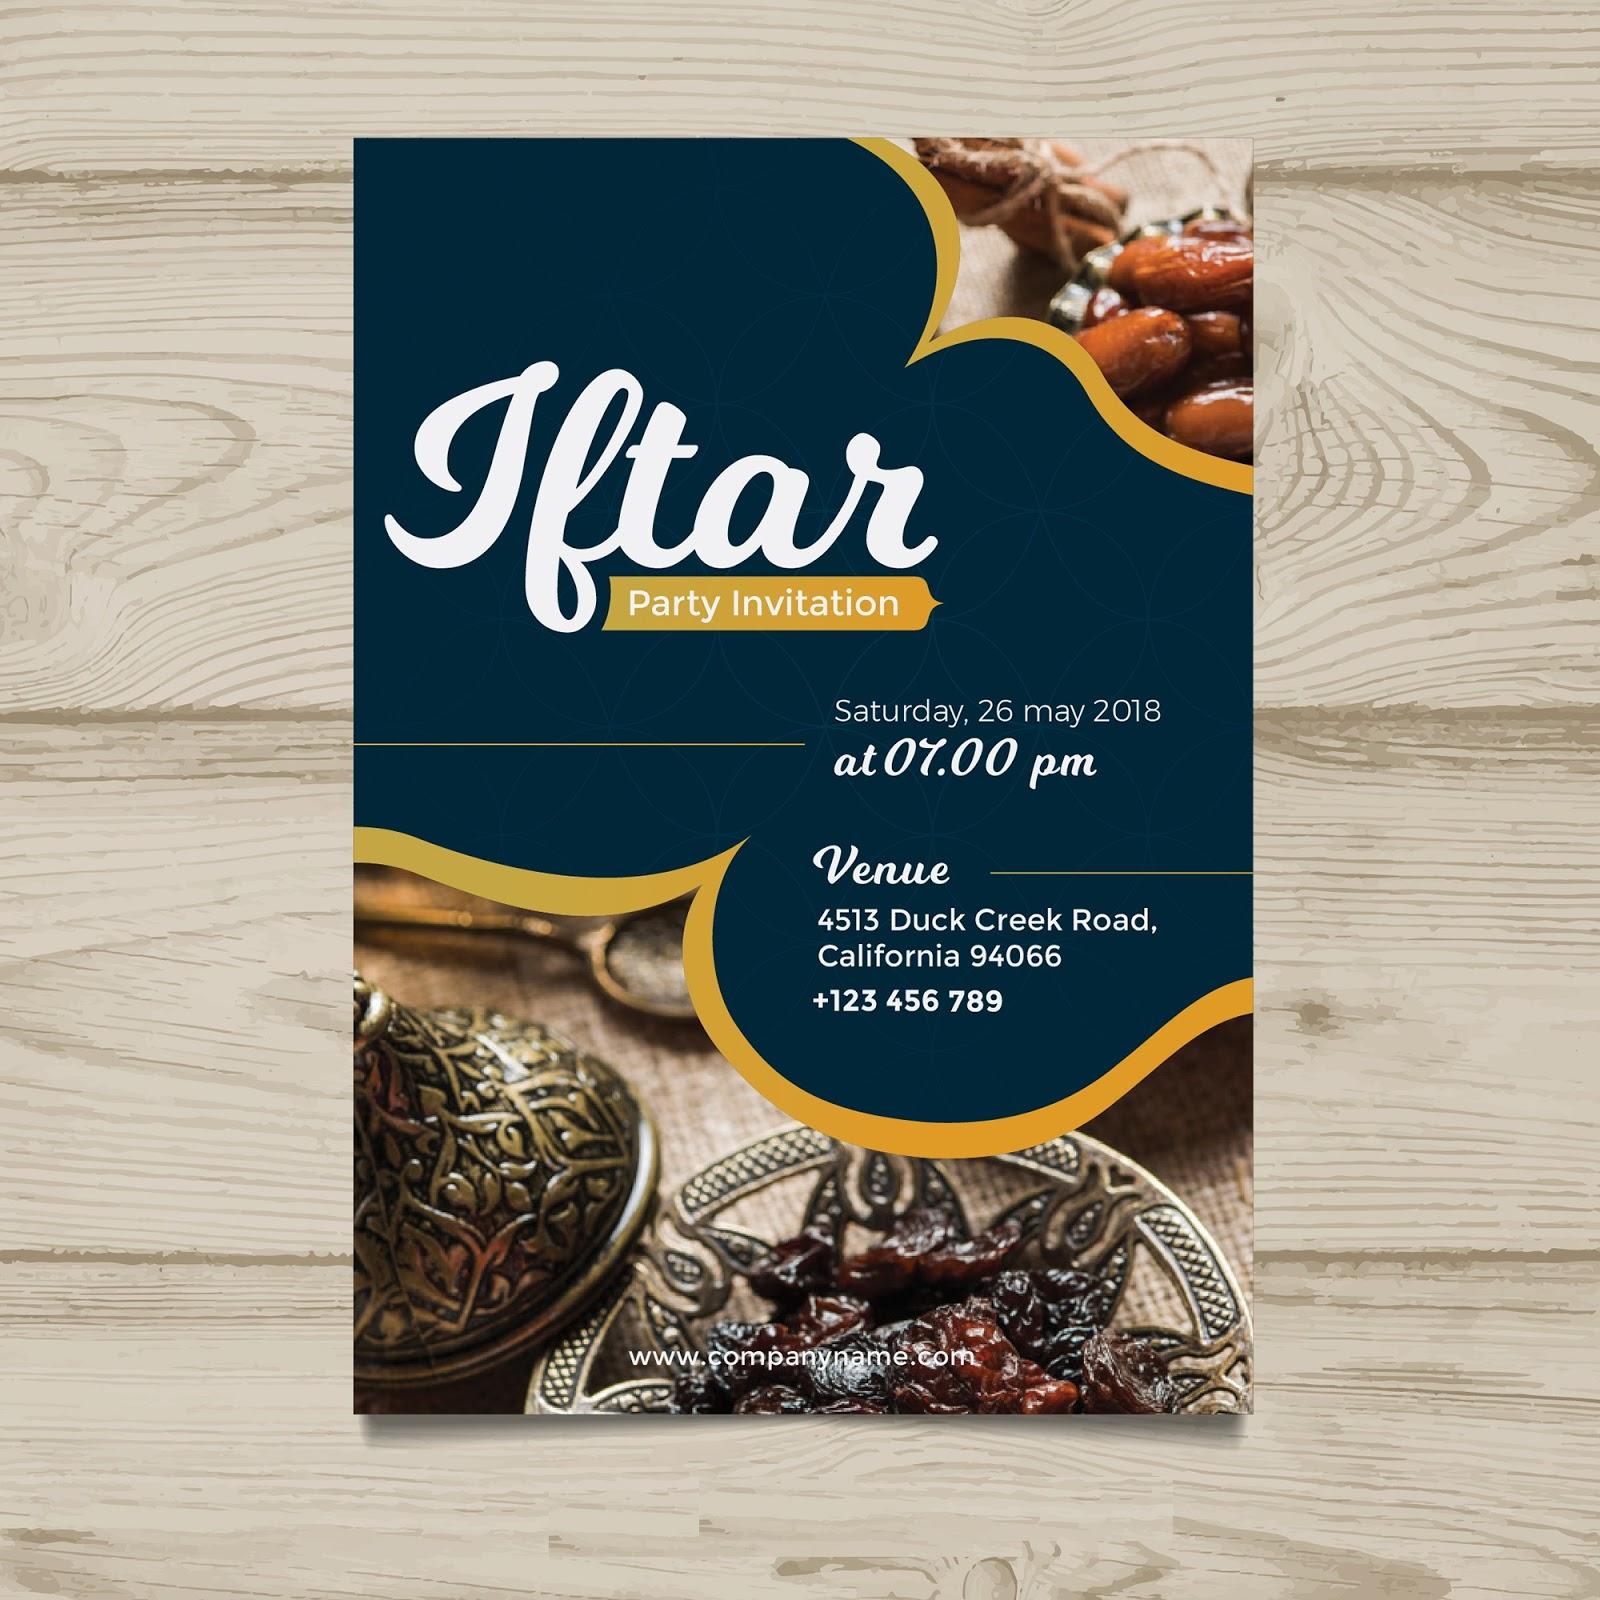 Ramadan-Iftaar-Invitation-Image